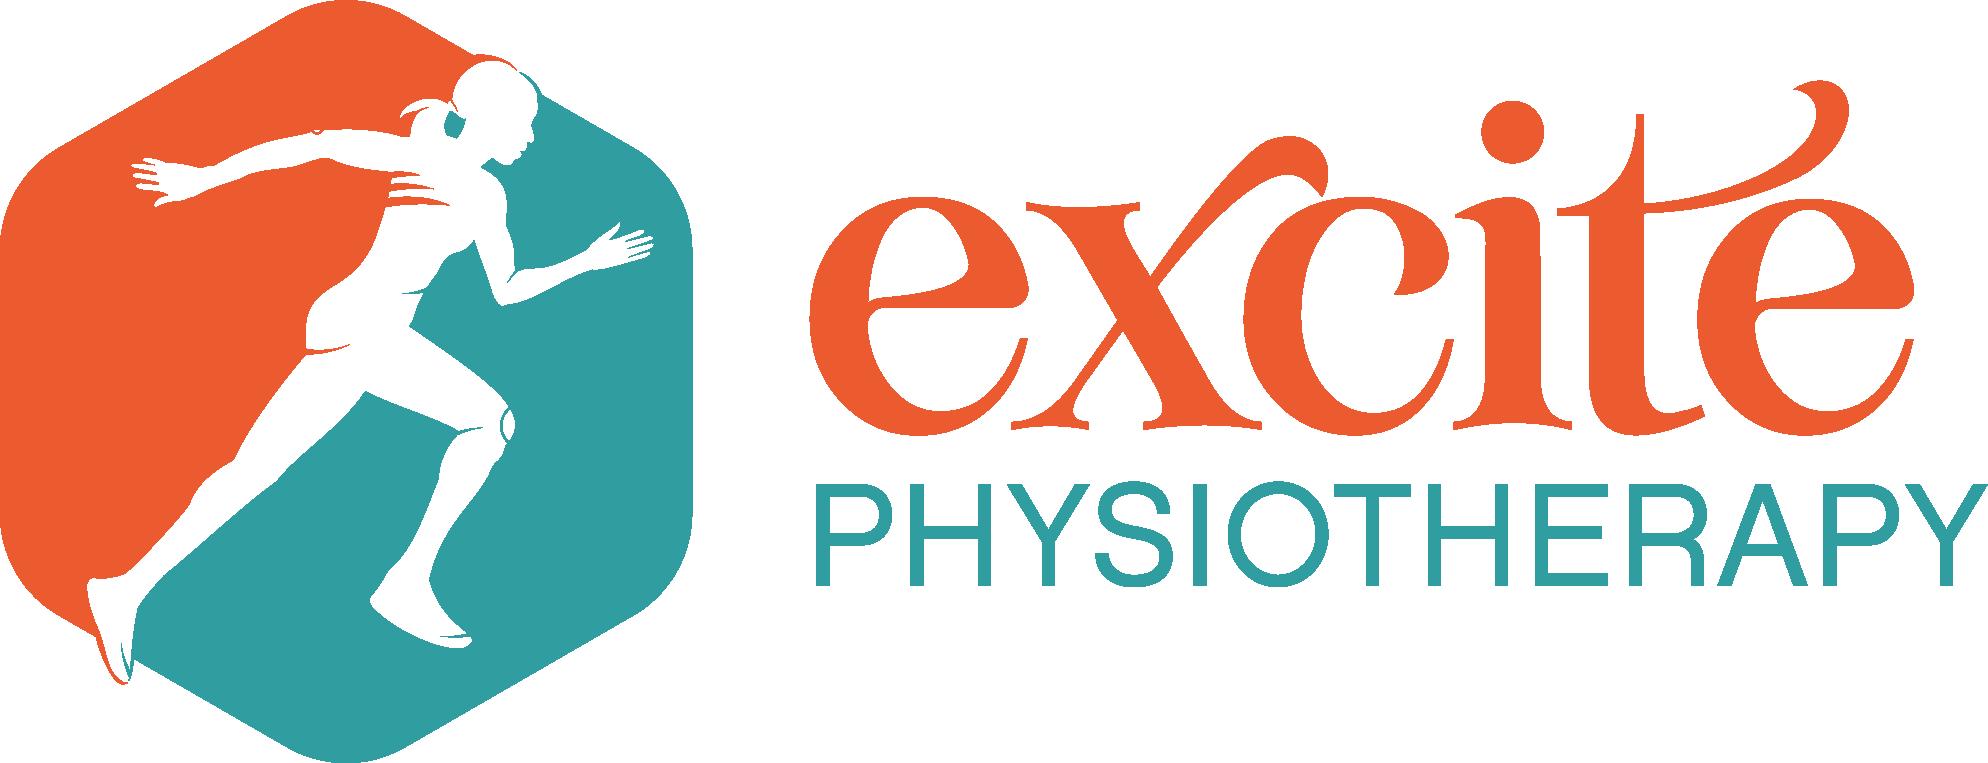 Excite Physio